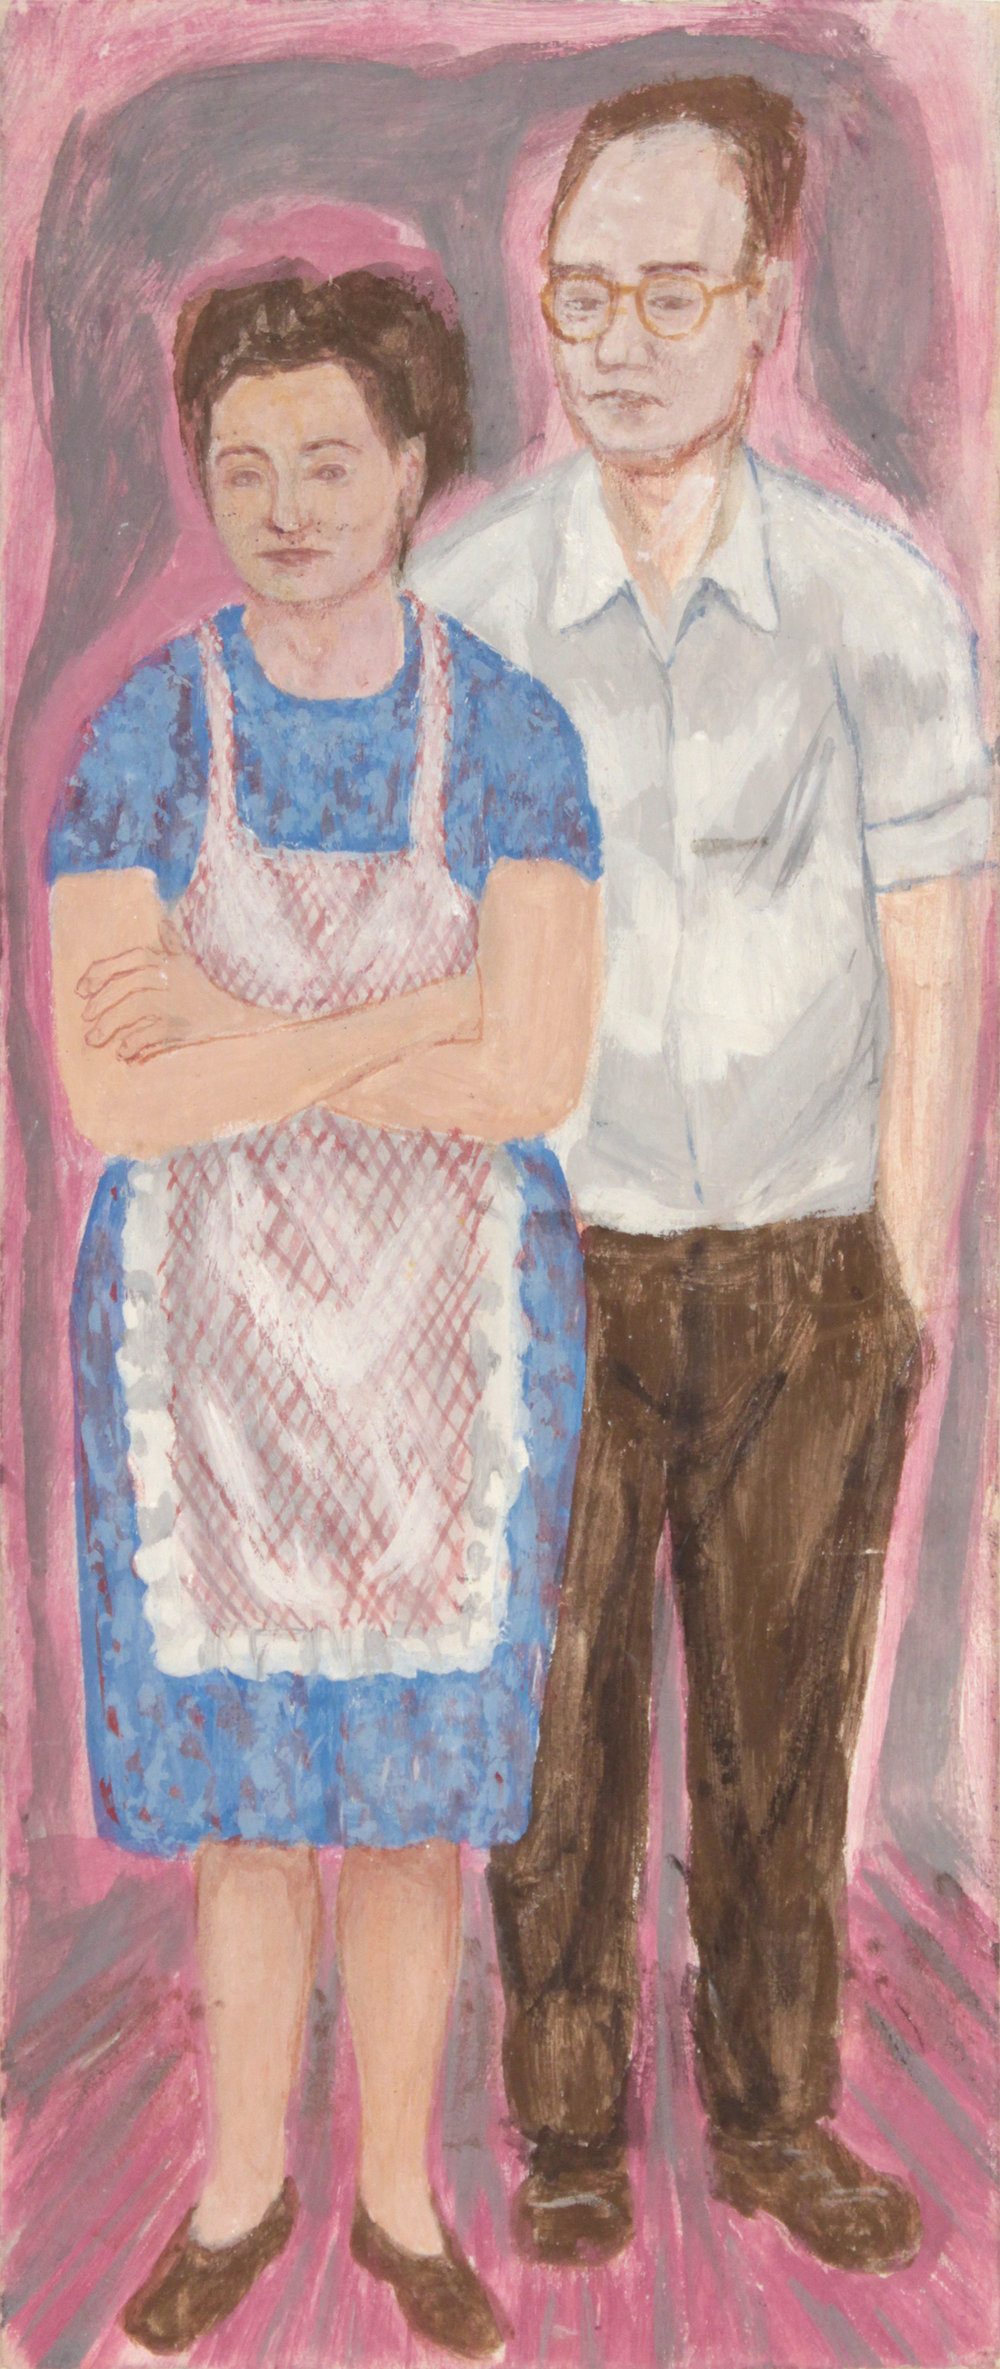 1. 1947-48 c, Image 46 (Artist's Parents), Casein on Board, 14x5 7:8, PPS 1416.JPG